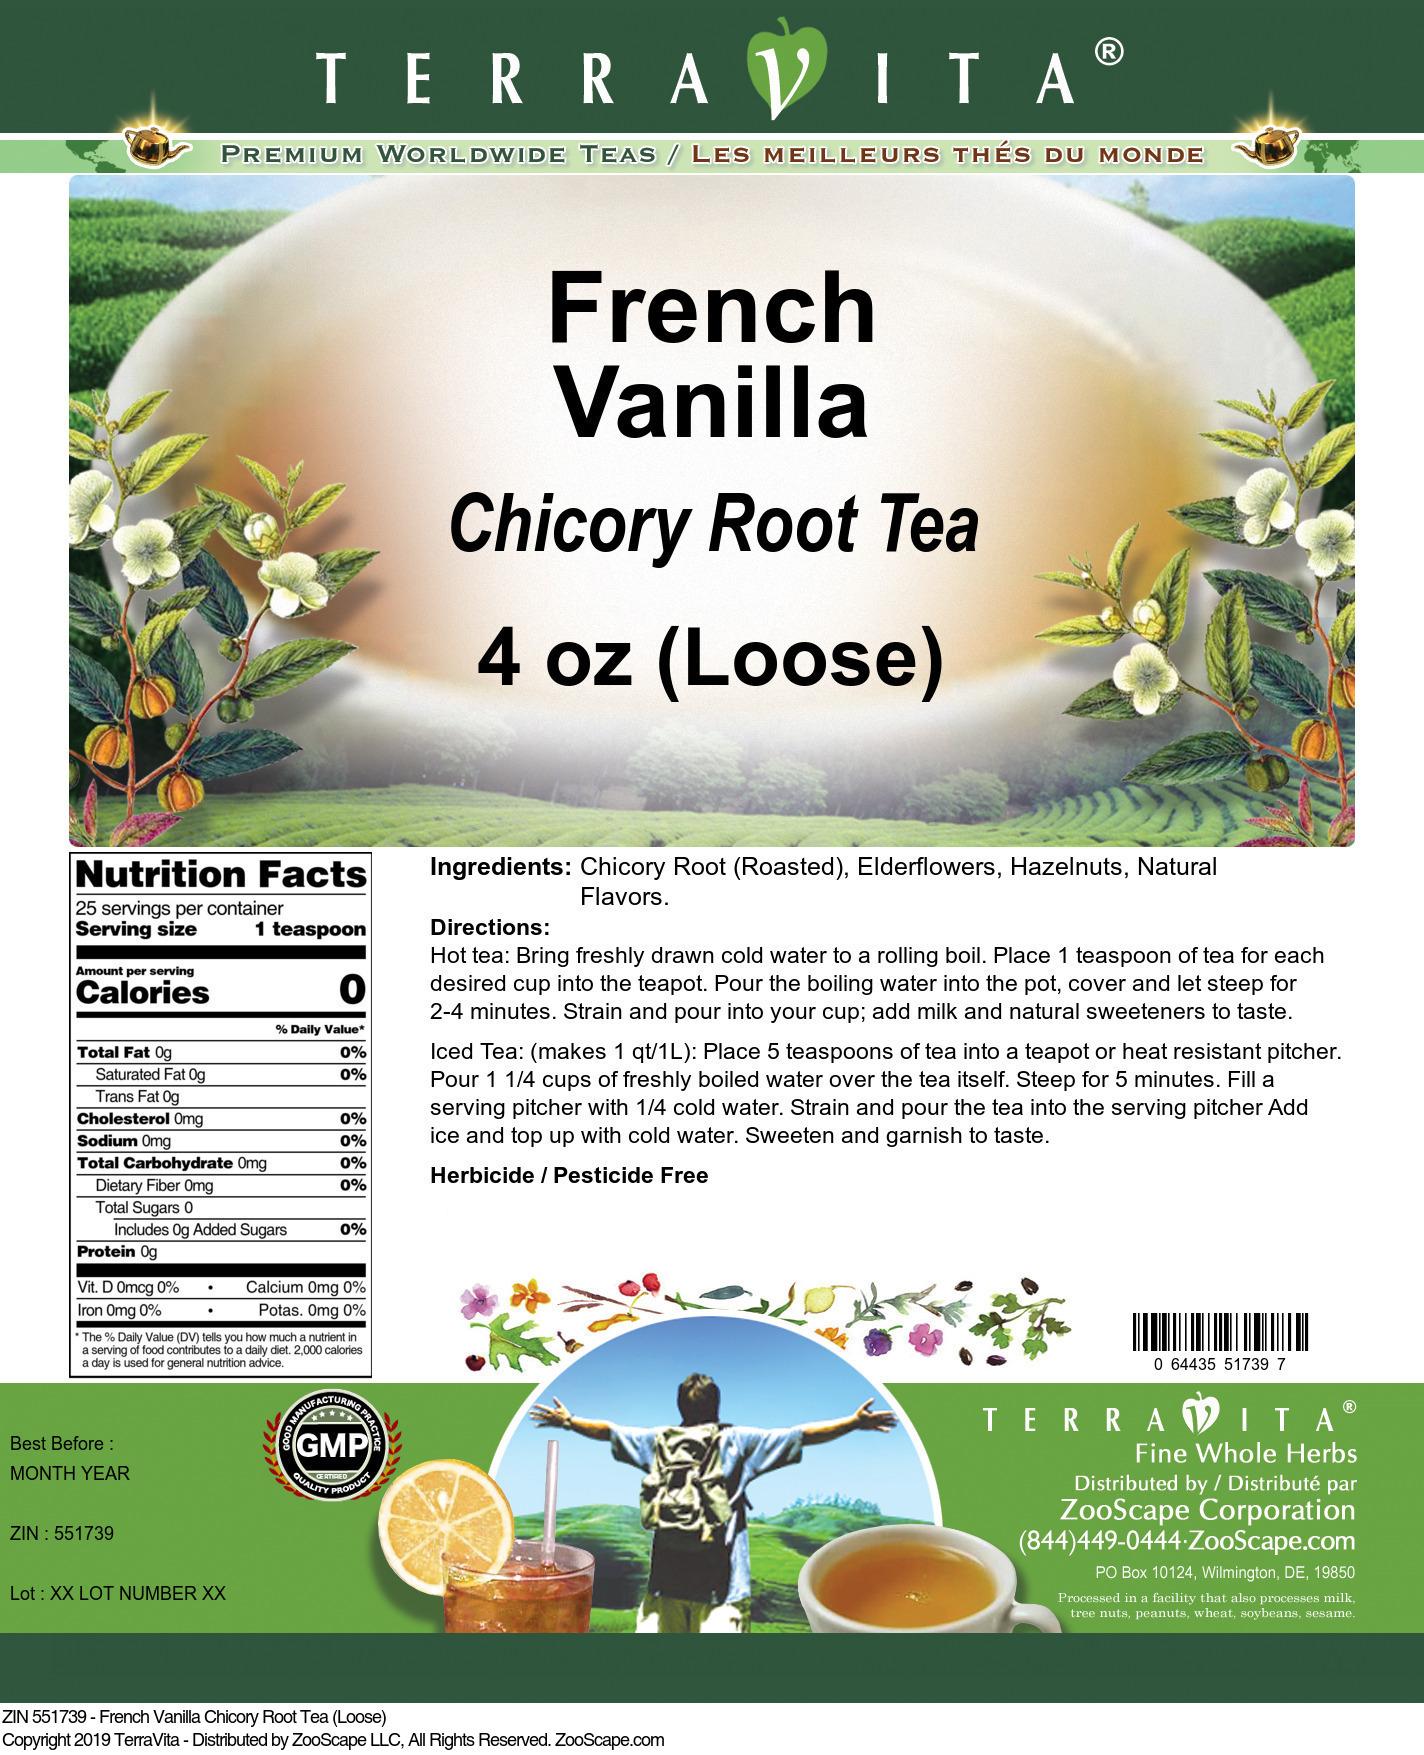 French Vanilla Chicory Root Tea (Loose)